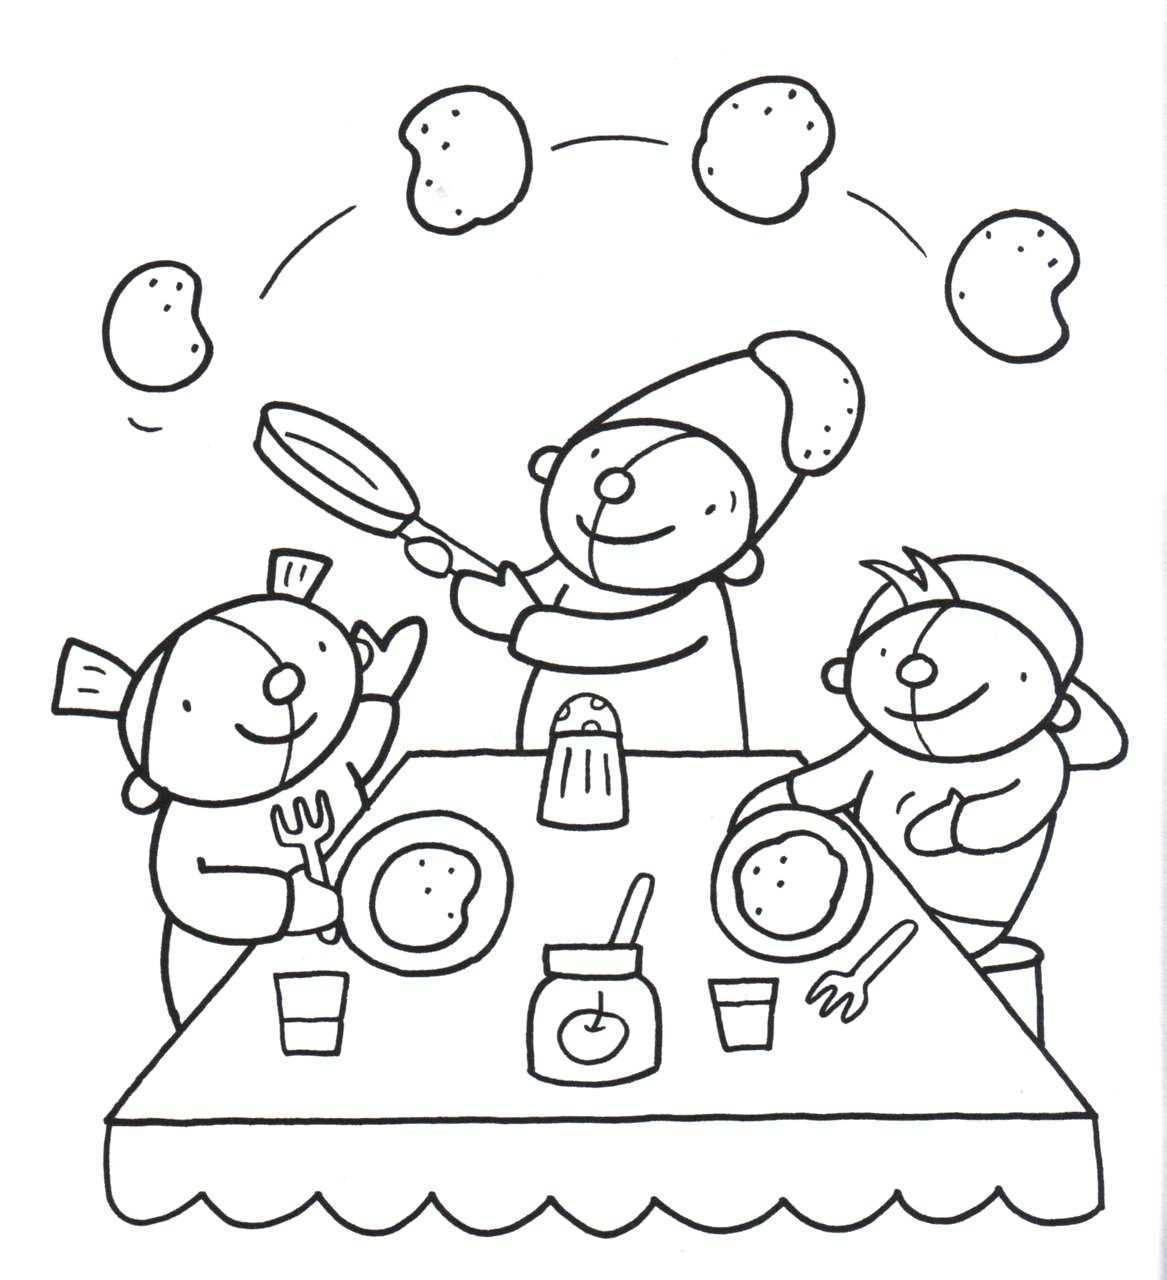 Kleurplaat Pompom Voeding Knutselen Thema Eten Kleurplaten Pom Pom